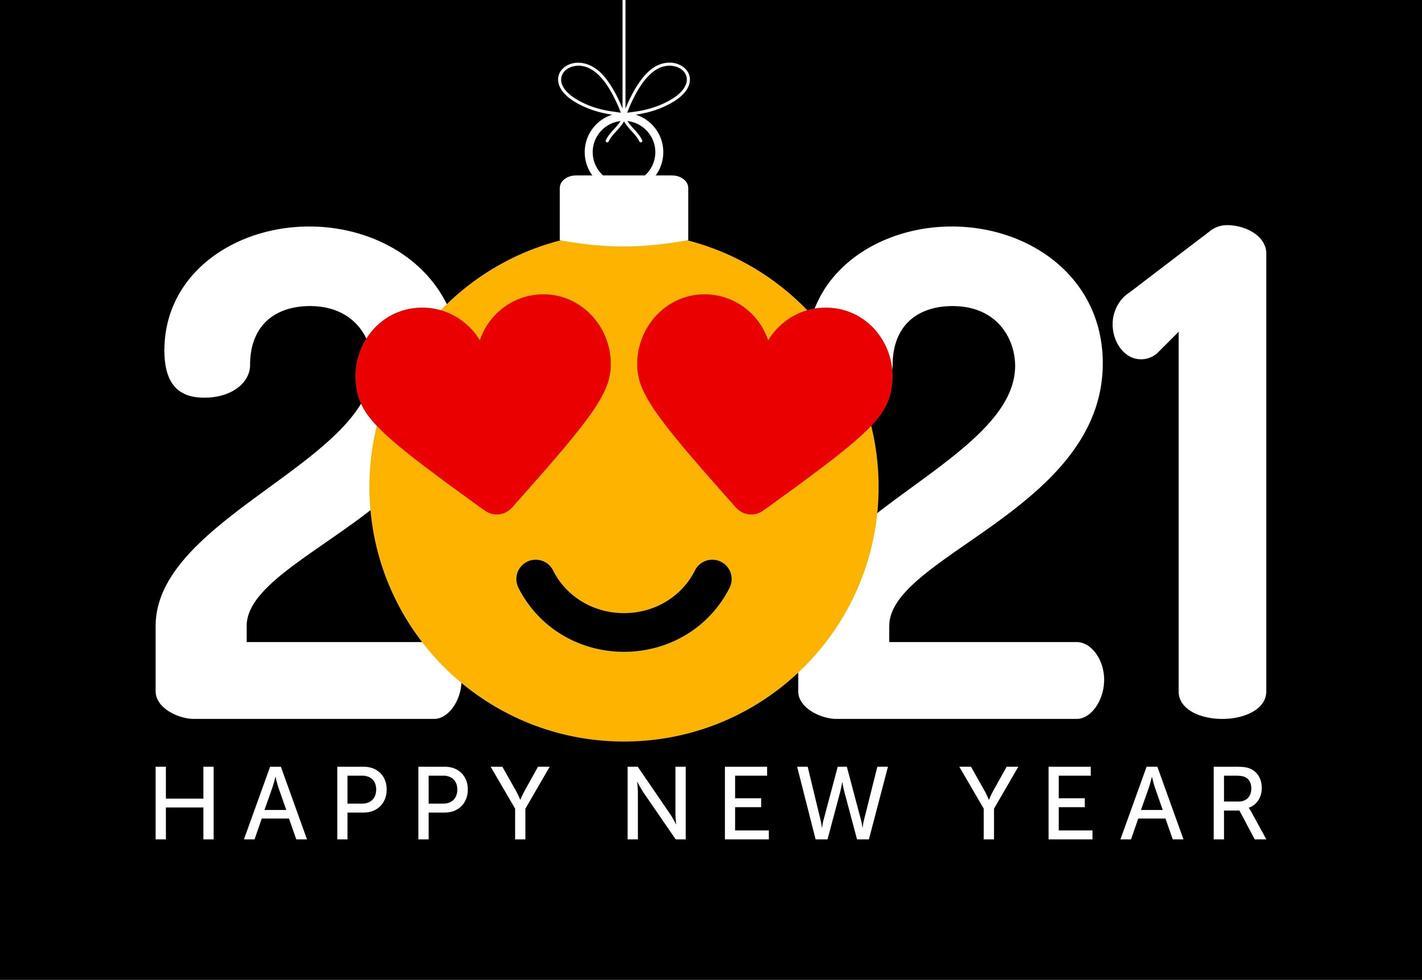 2021 new year greeting with heart eye emoji ornament vector